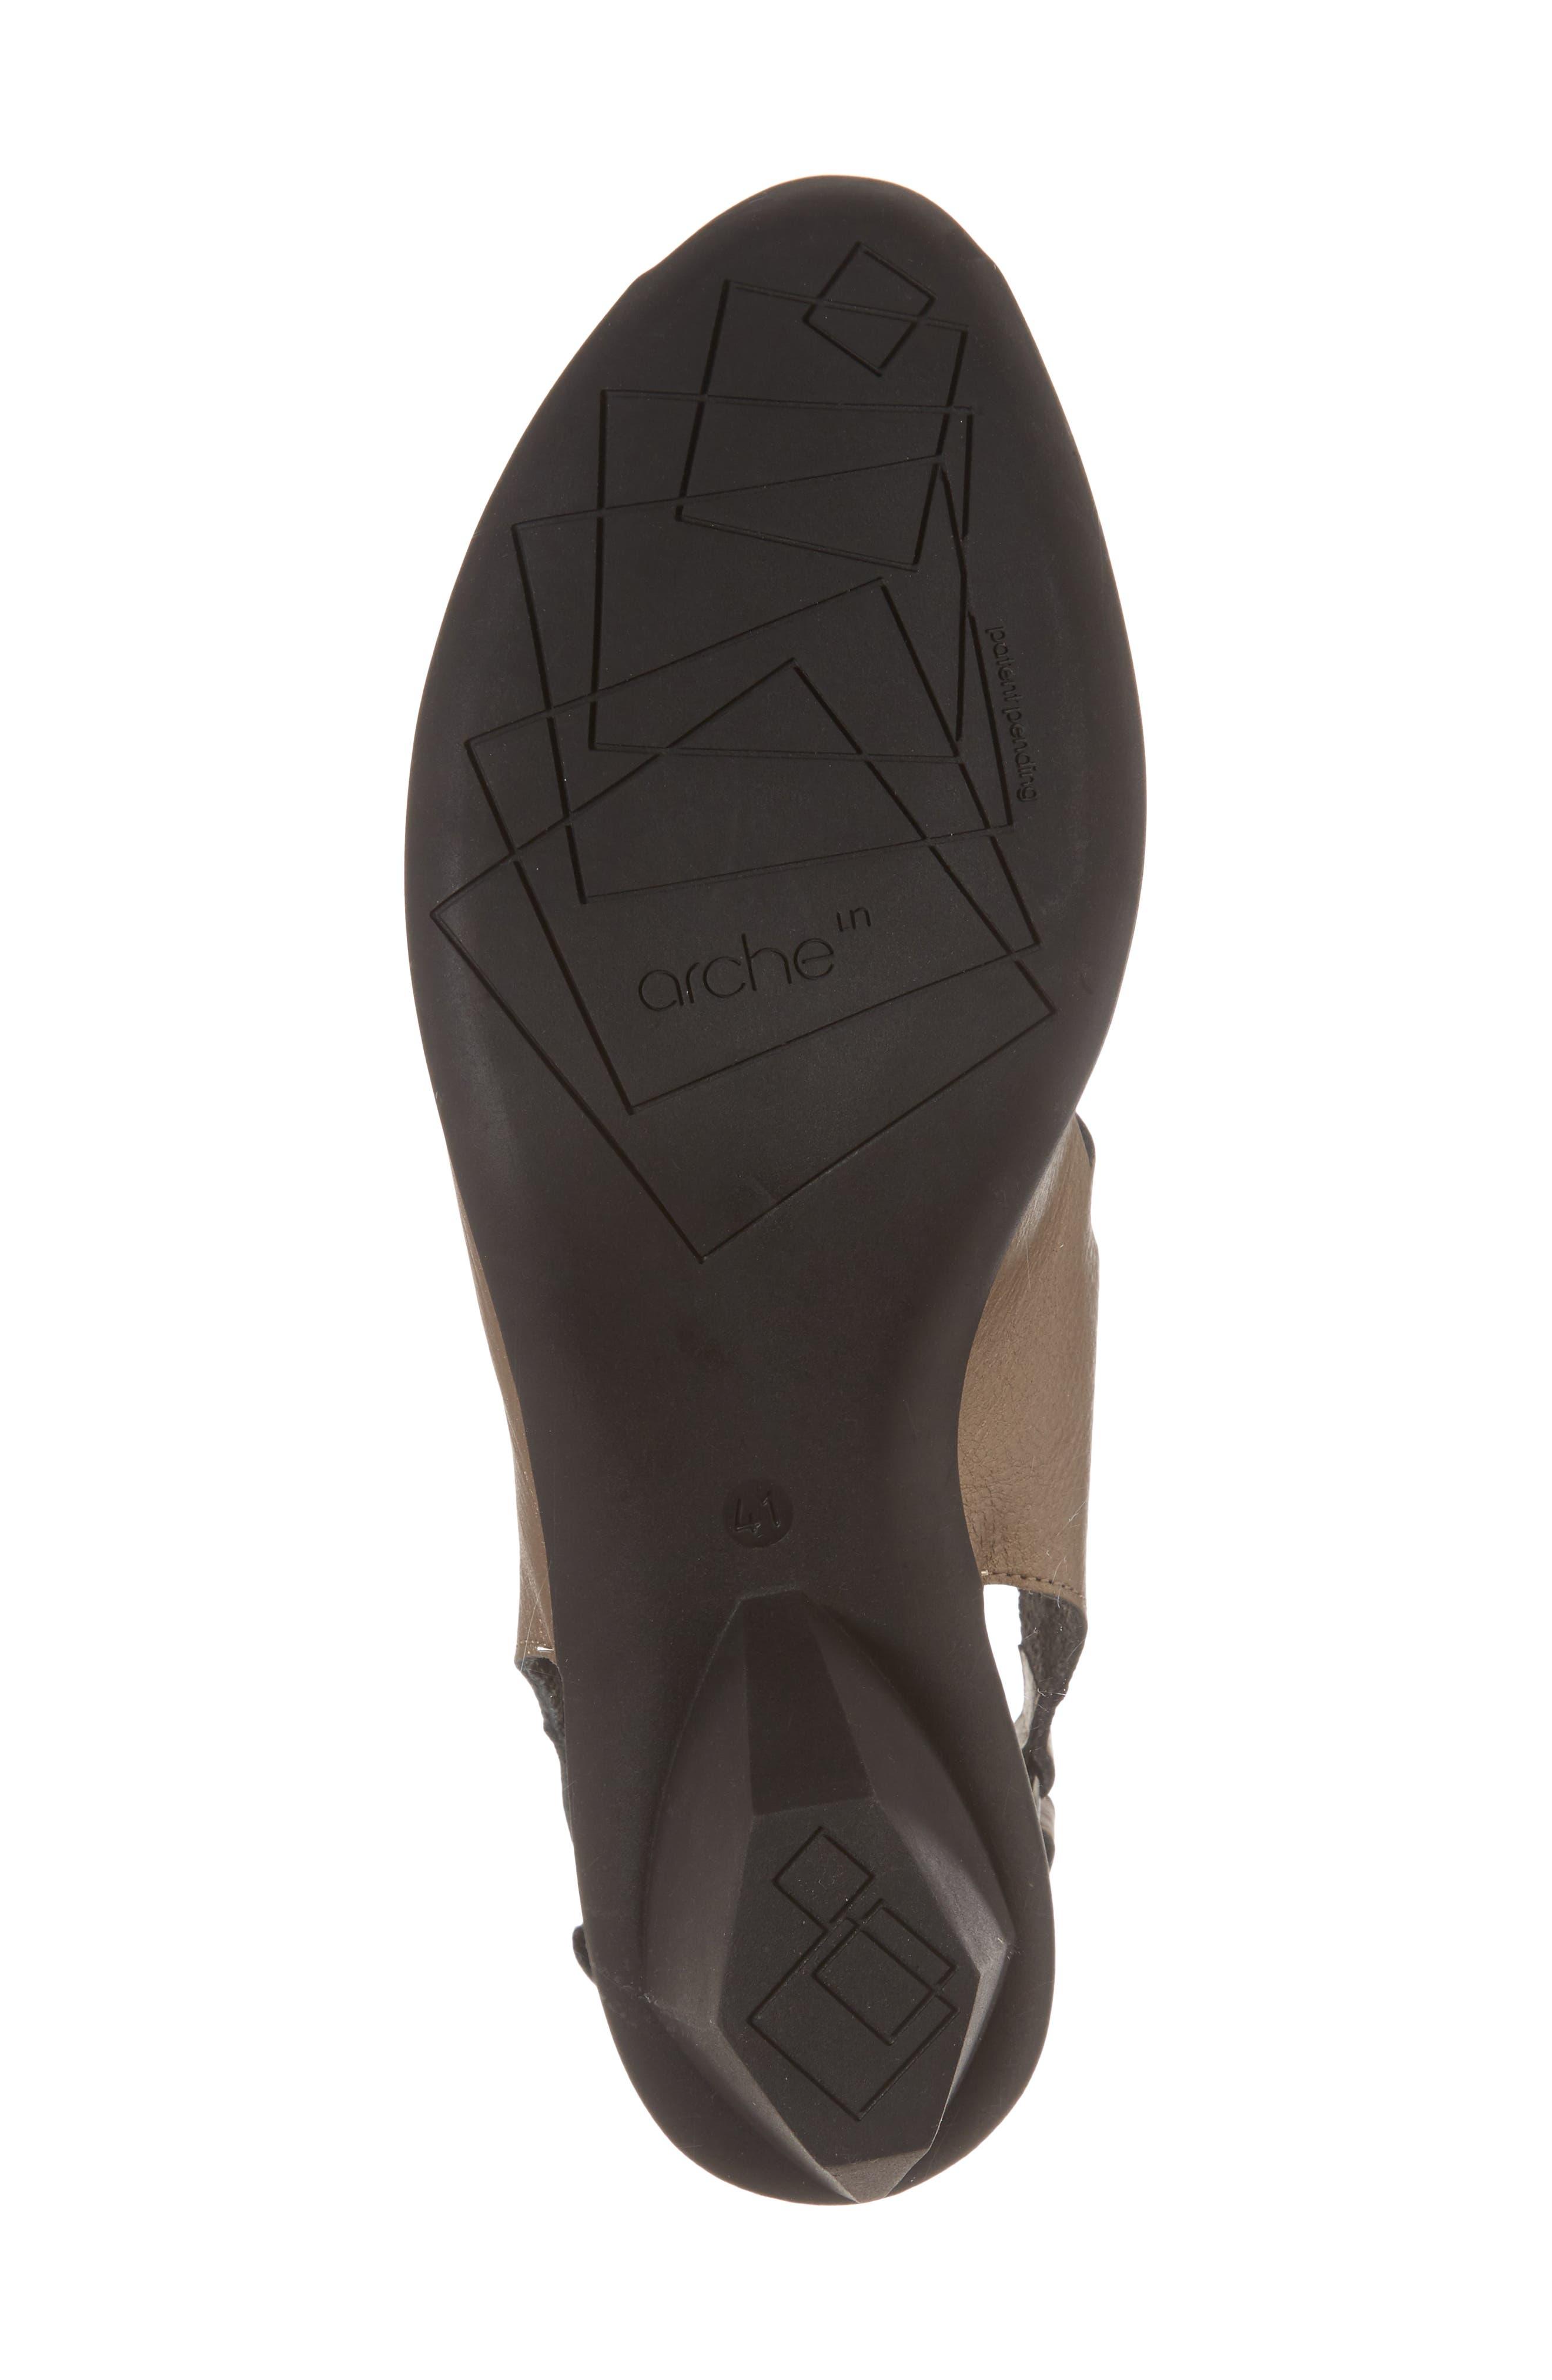 Enexor Sandal,                             Alternate thumbnail 6, color,                             Moon/ Noir Leather